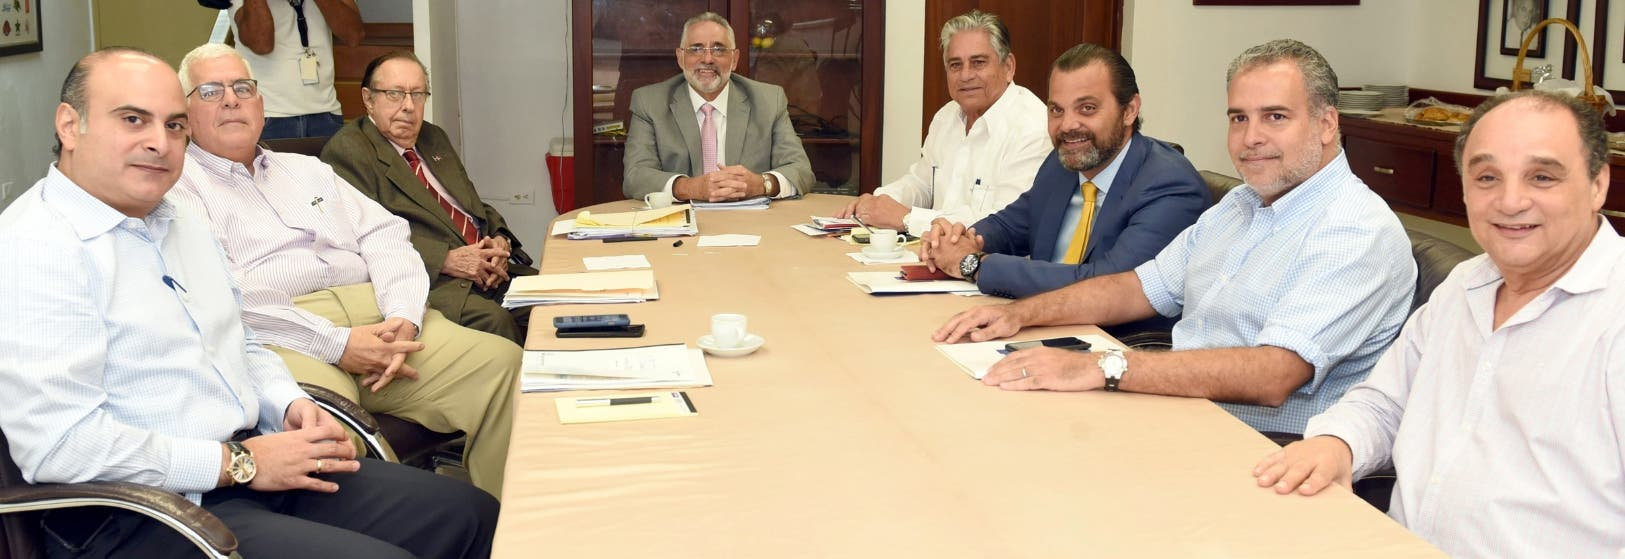 Integrantes de las seis franquicias  durante la asamblea celebrada ayer, donde se escogió a Vitelio Mejía, como presidente de la Liga.